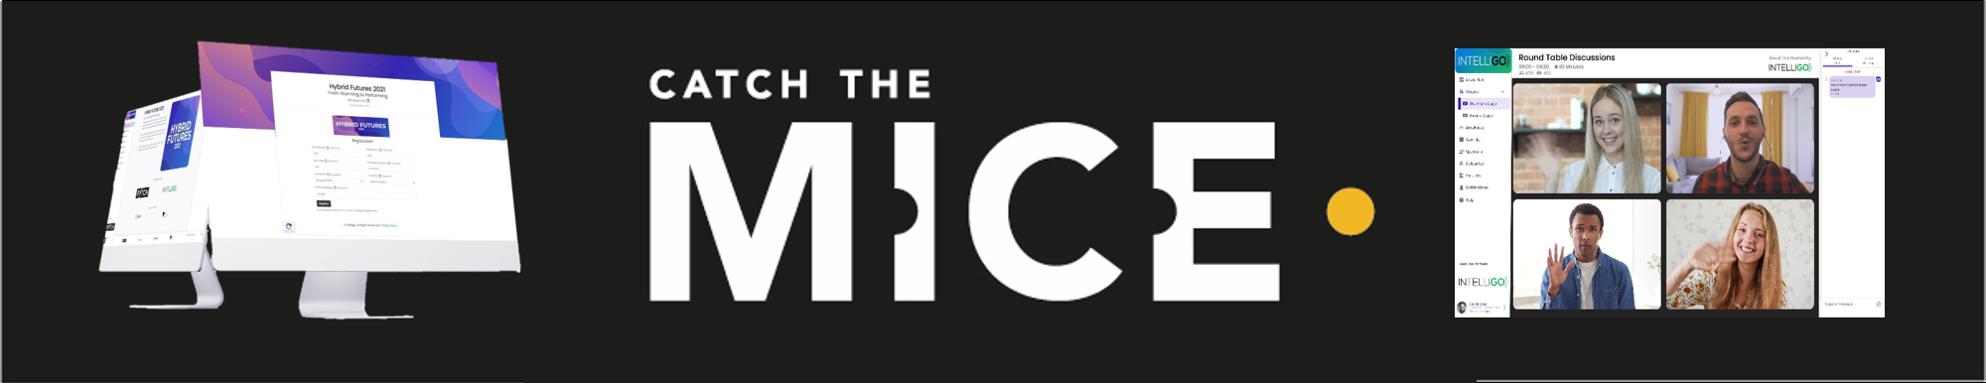 Catch the MICE